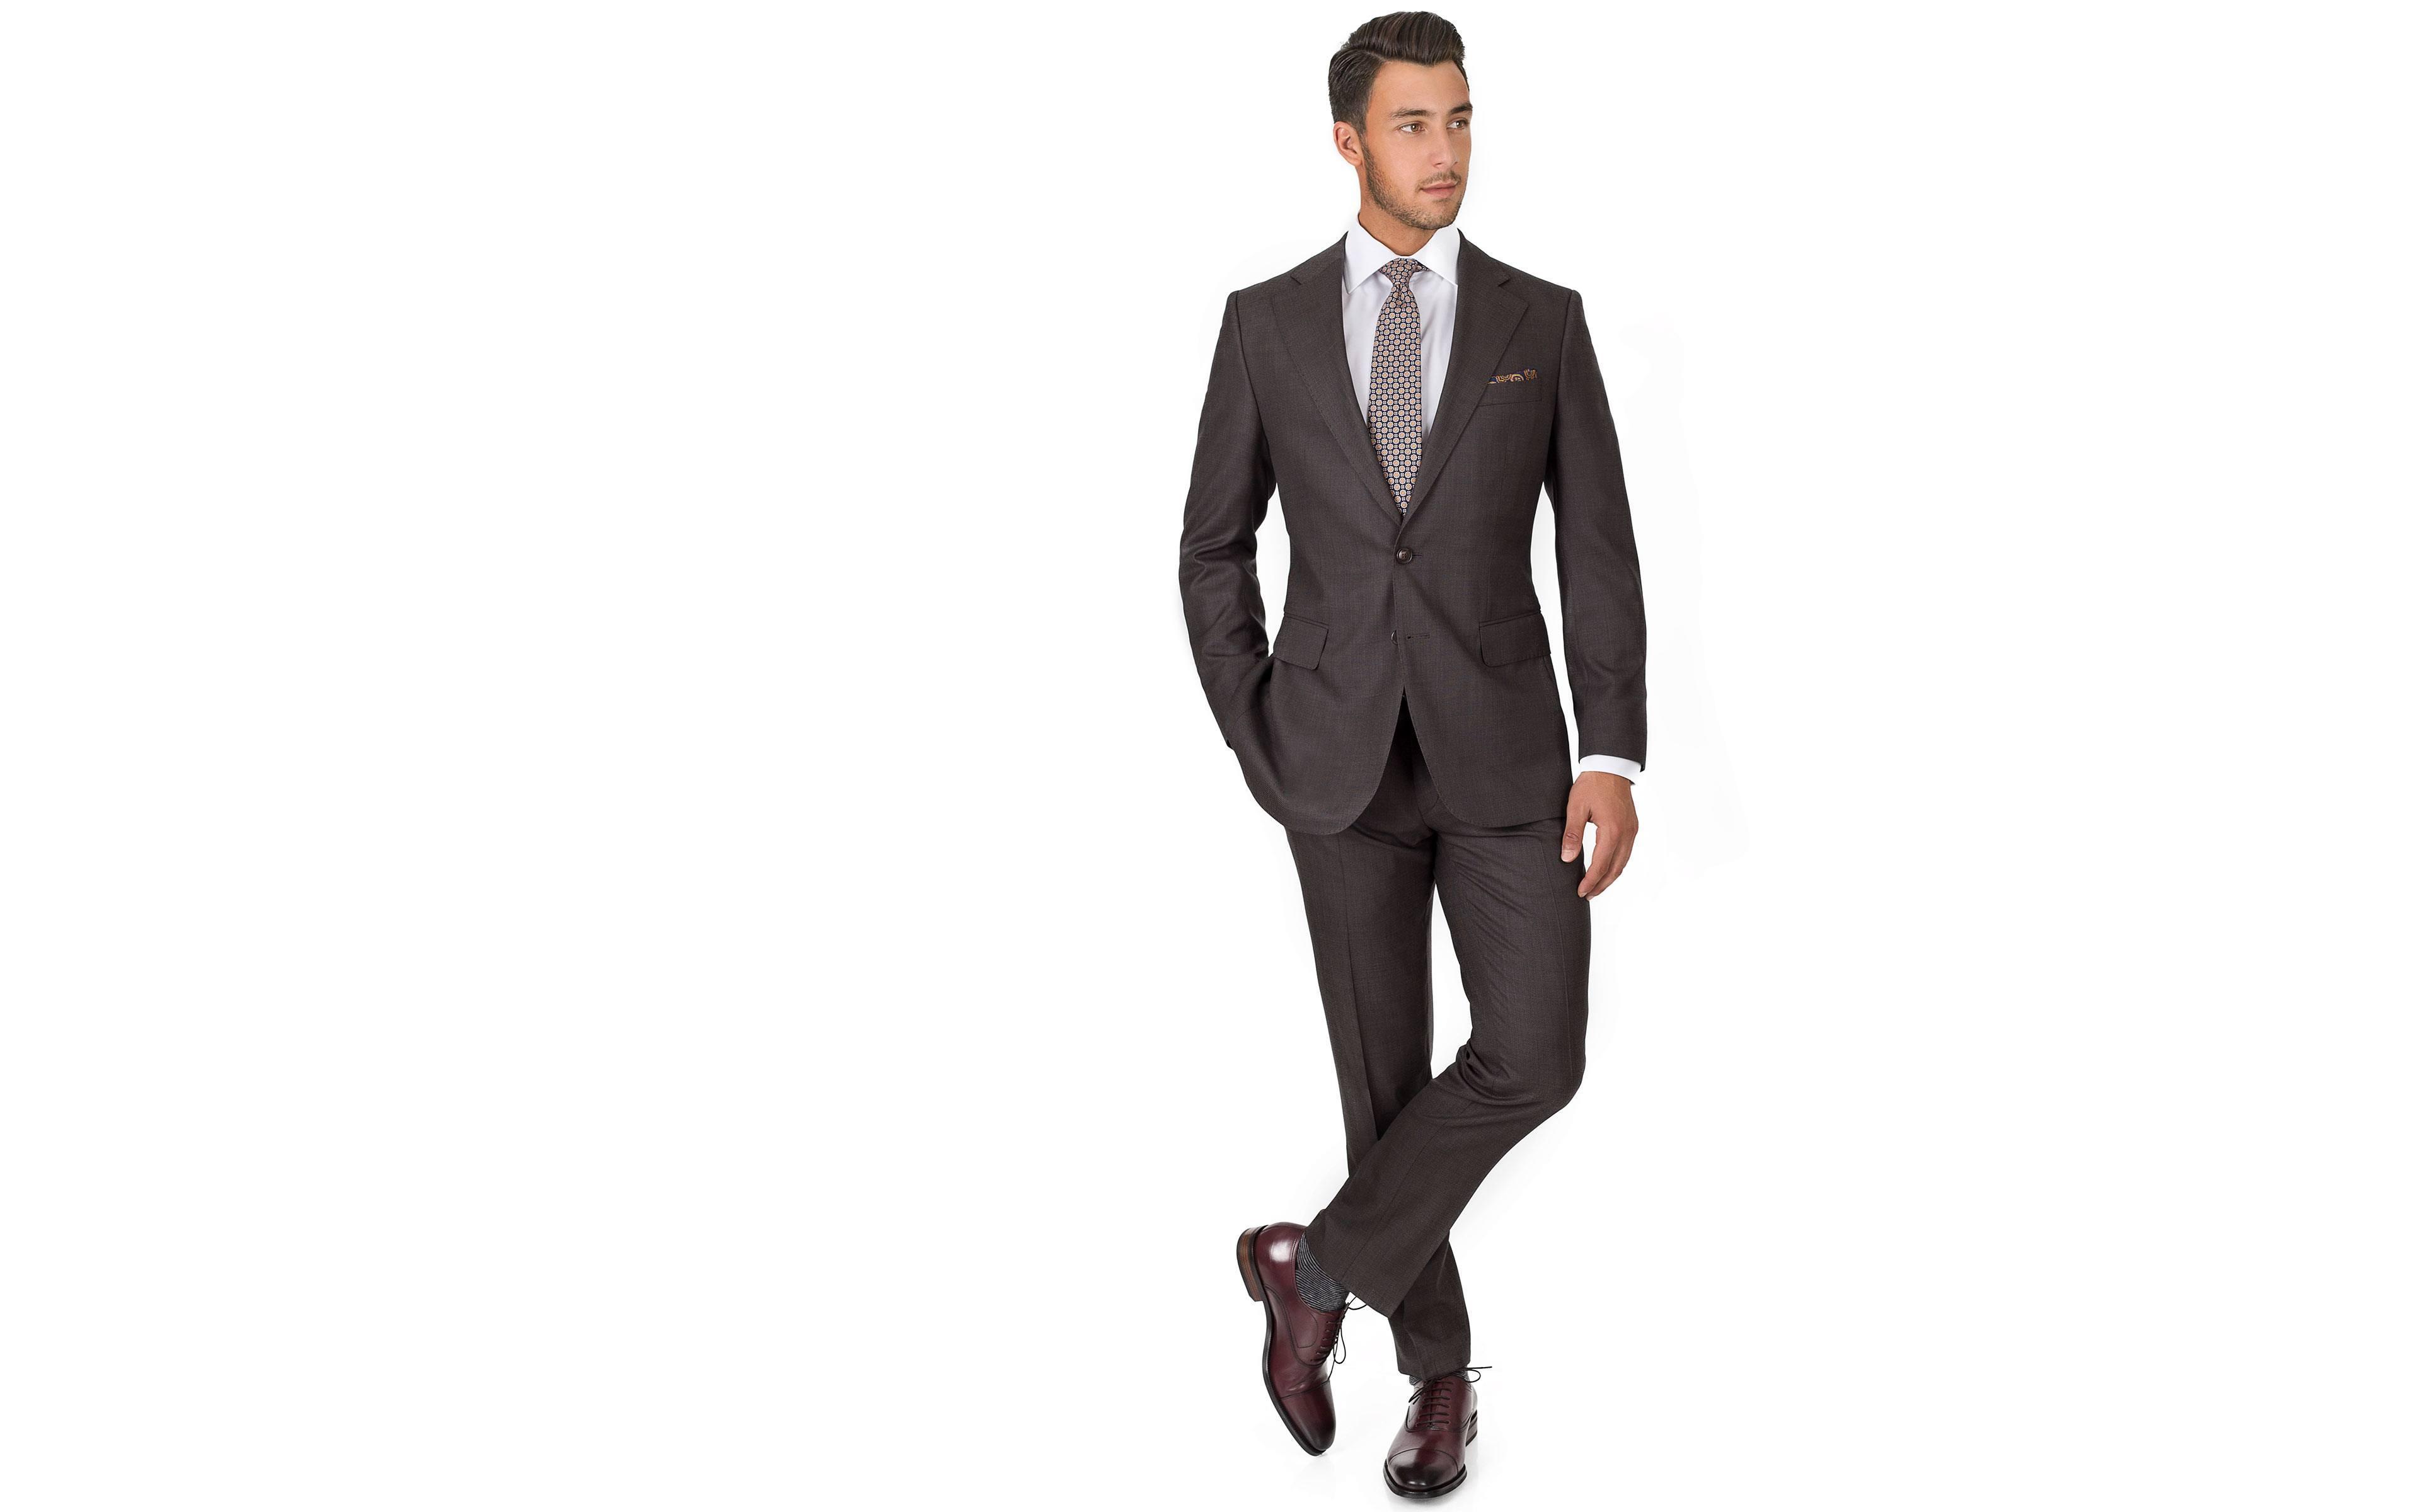 Vendetta Premium Charcoal Brown Birdseye Suit